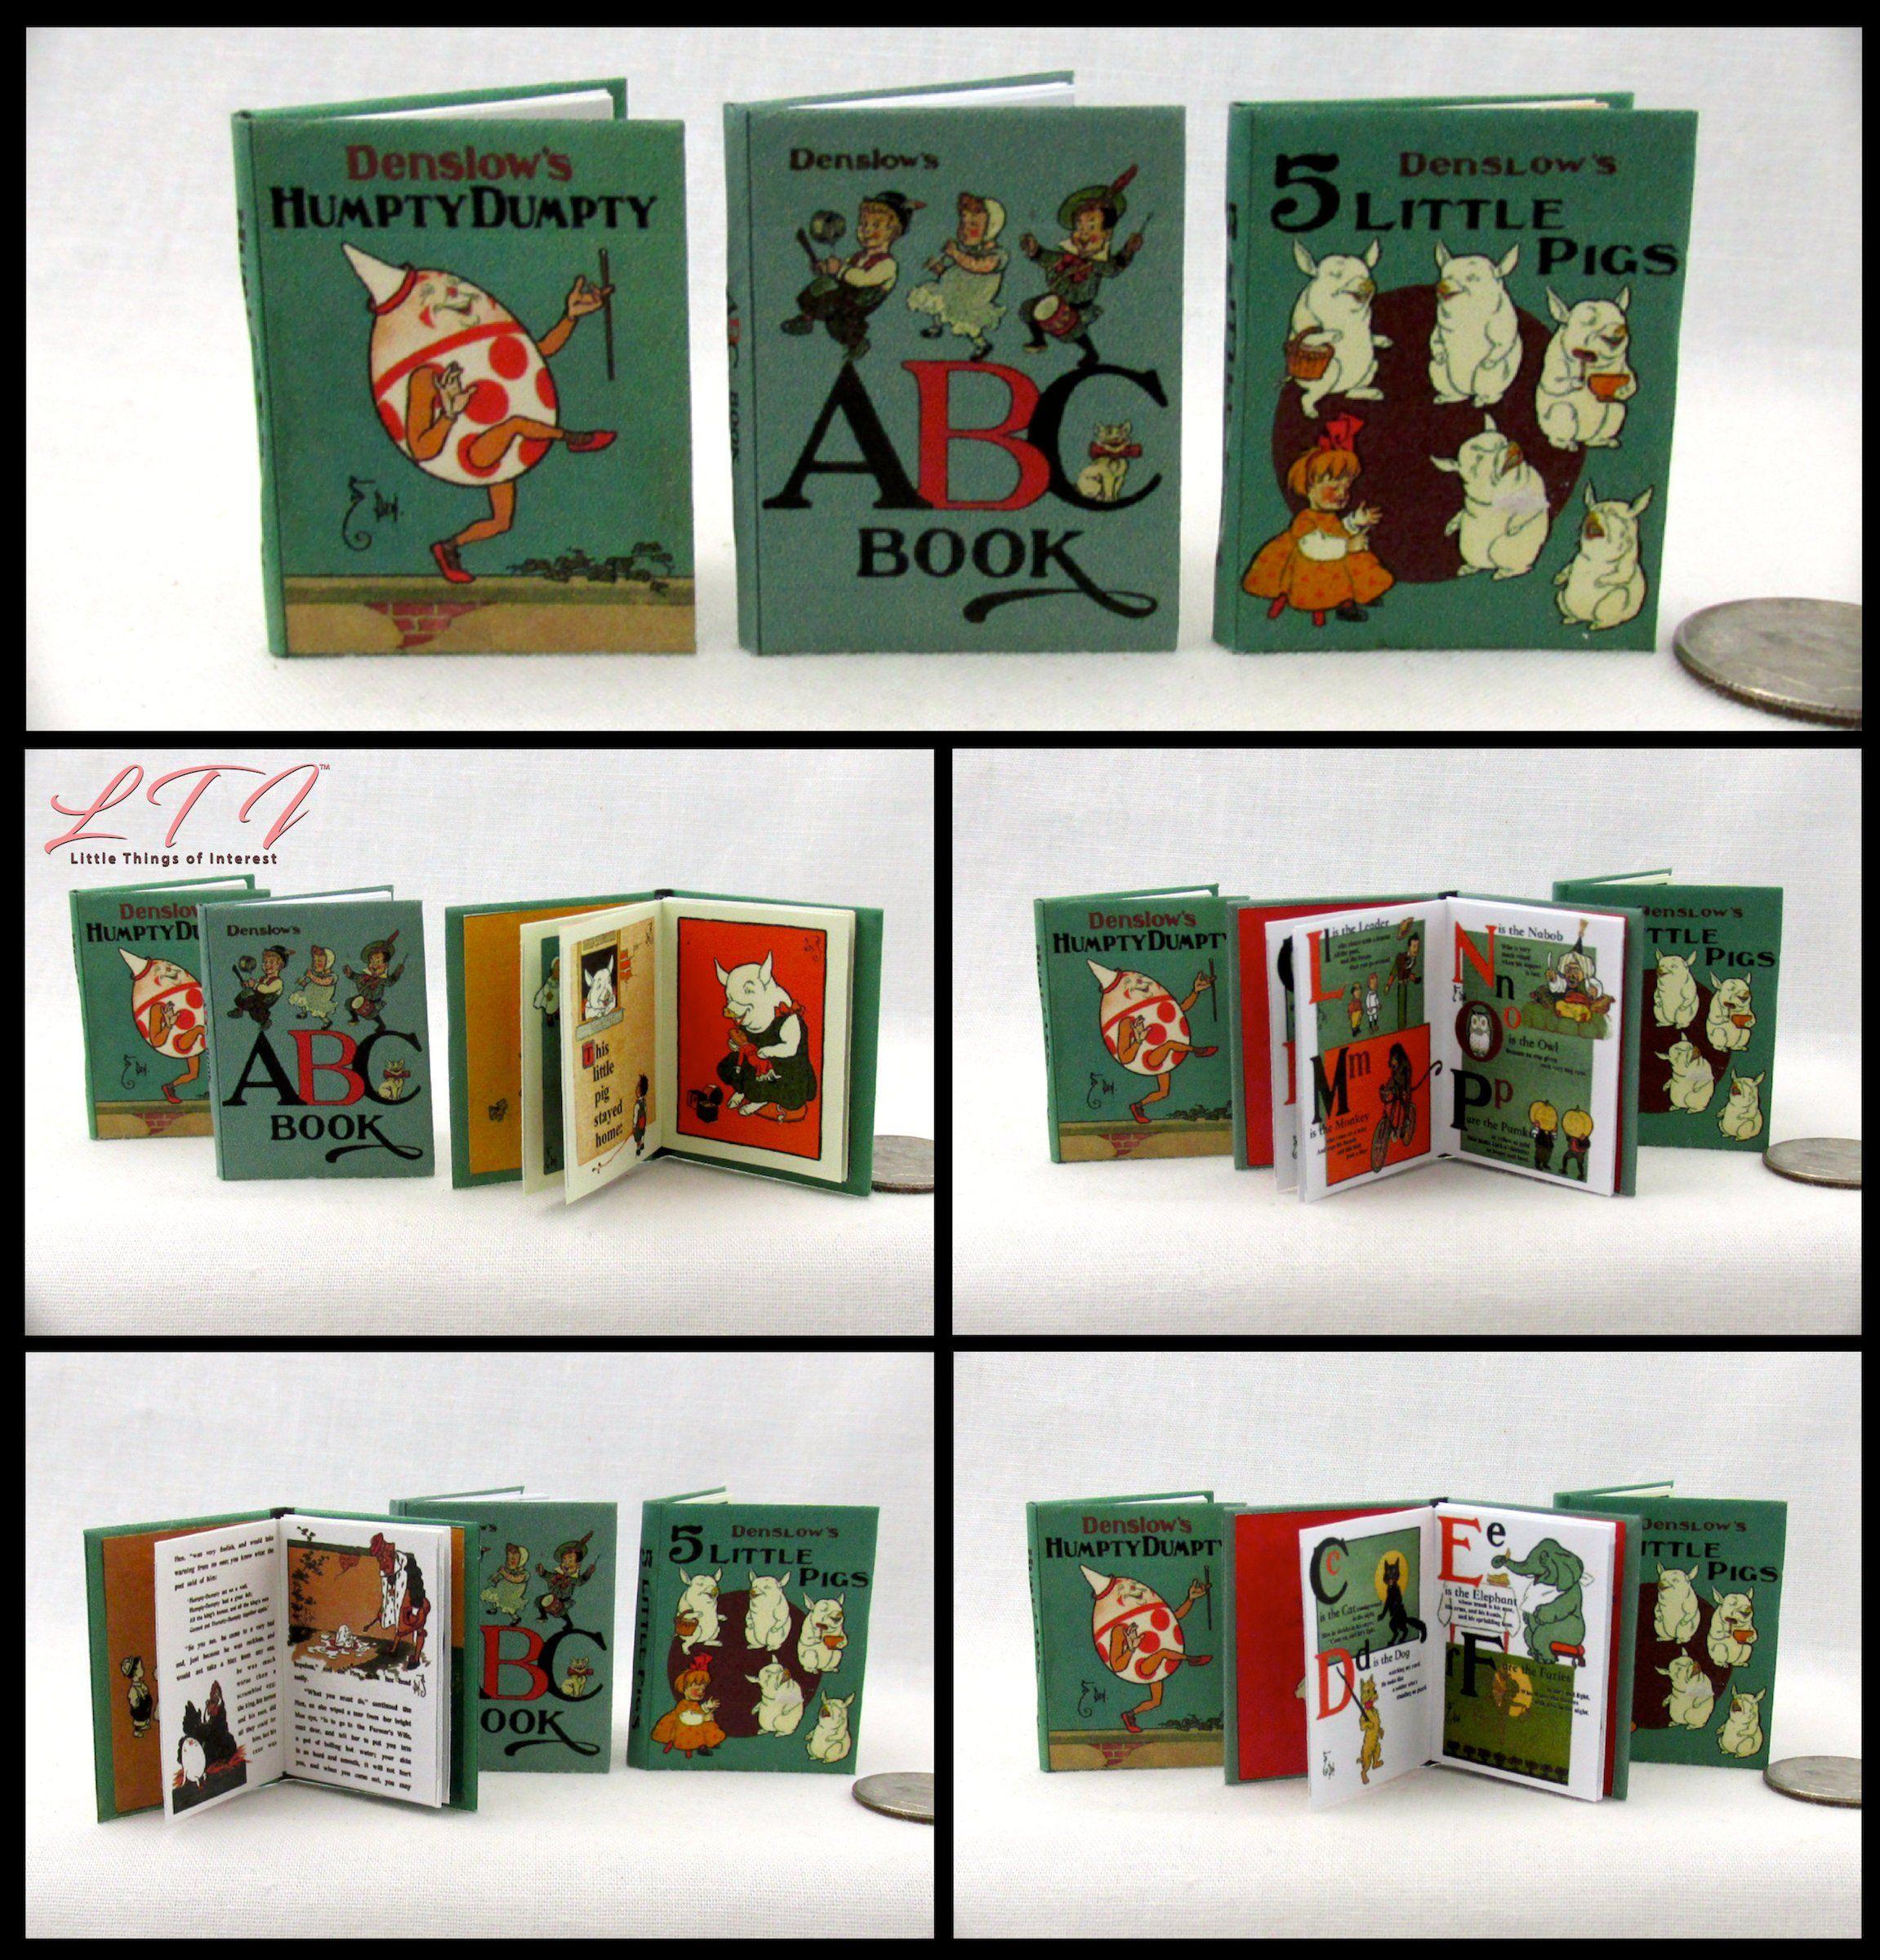 HUMPTY DUMPTY ABC/'S 5 LITTLE PIGS Miniature Dollhouse 1:12 Scale Books